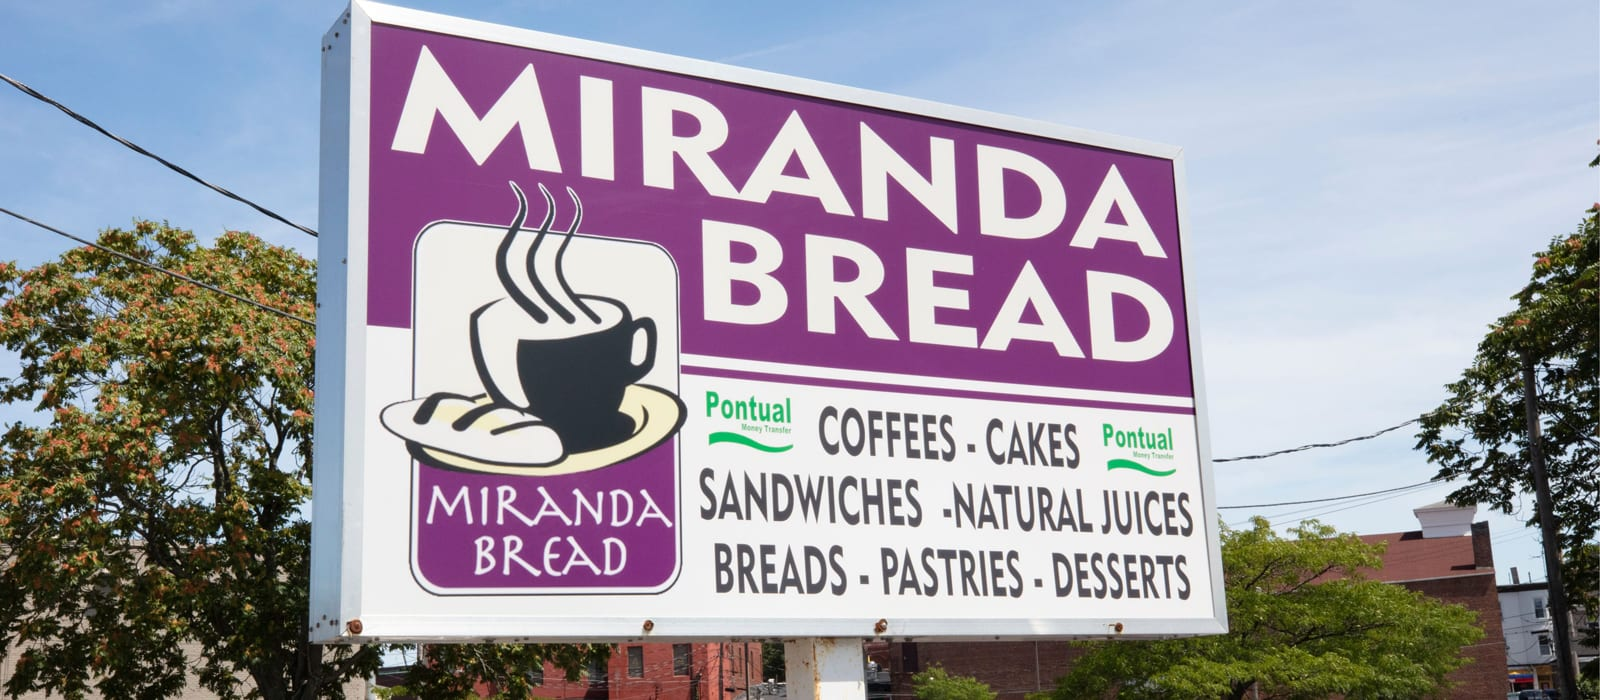 Miranda Bread cafe near Alta Union House